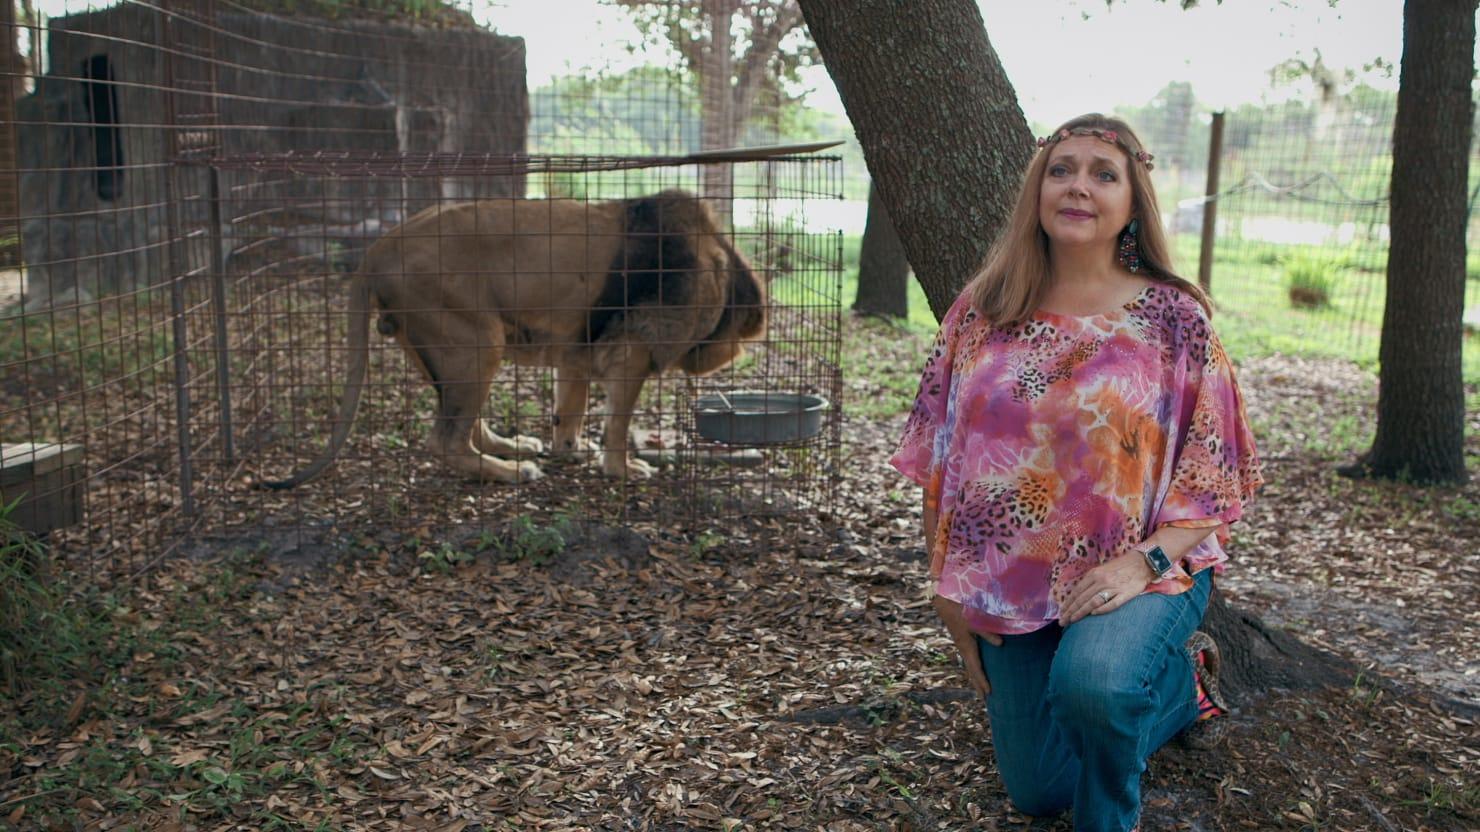 'Tiger King's' Carole Baskin Denies Murdering First Husband, Mincing Him and Feeding Him To Big Cats